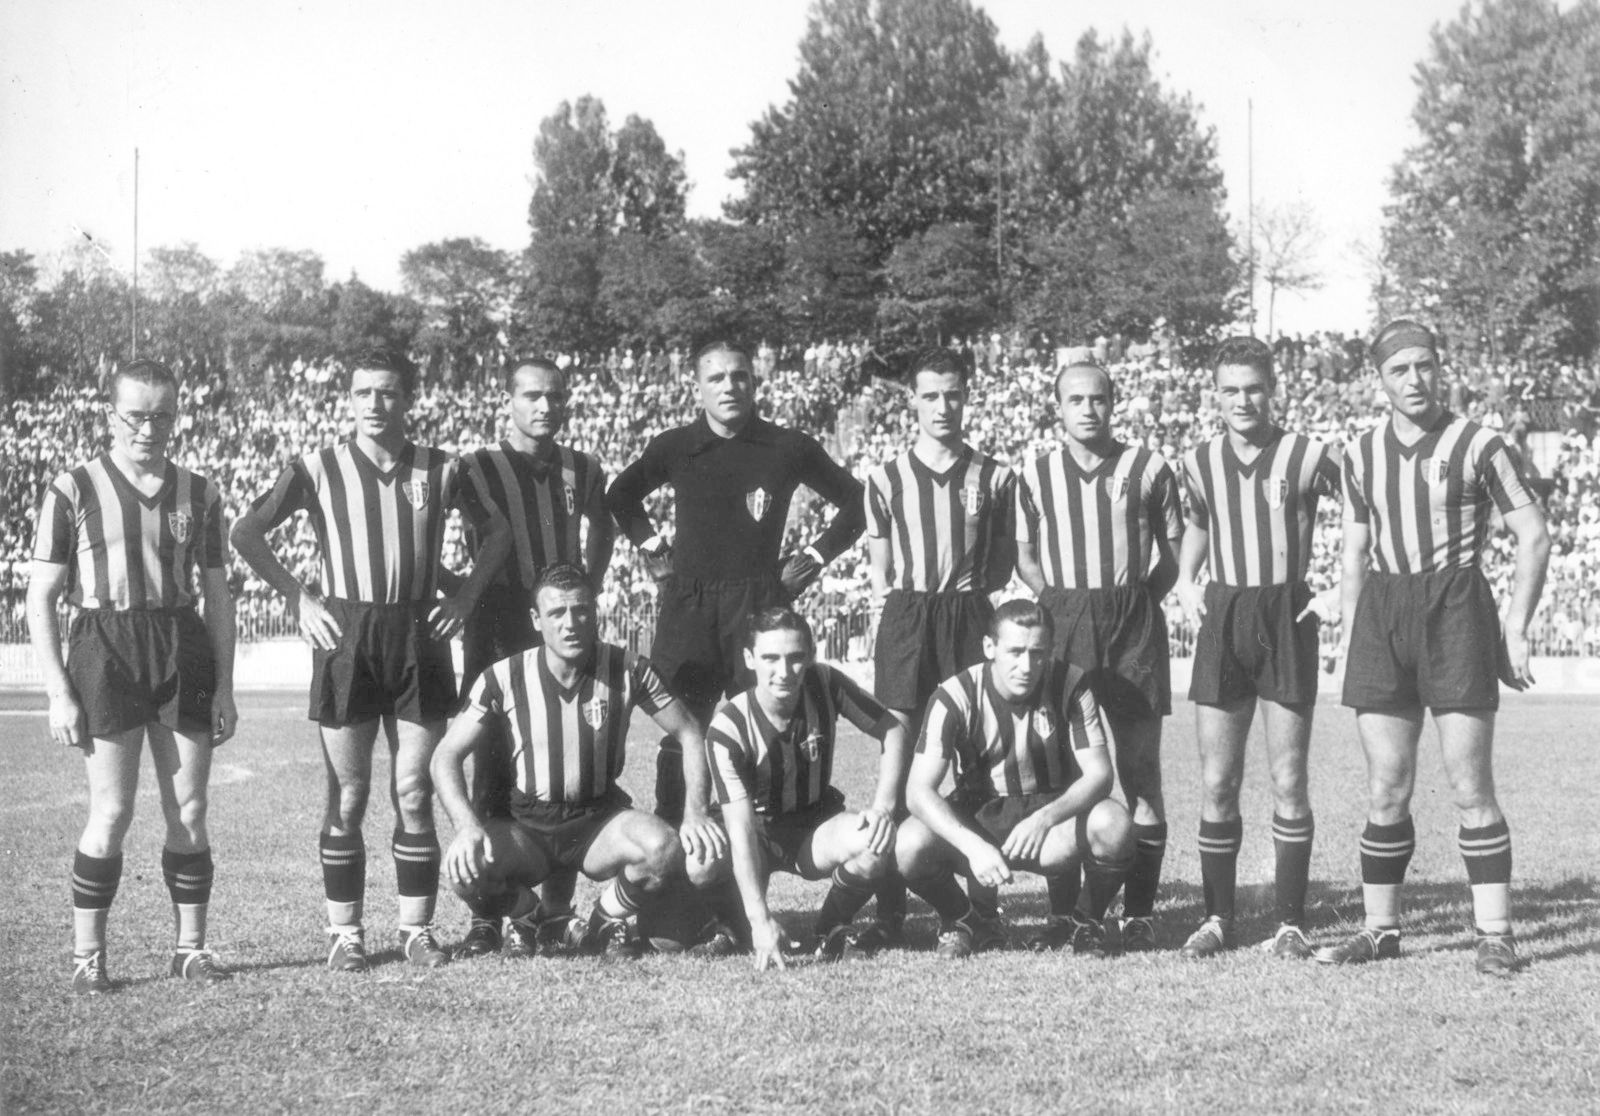 Throwback Thursday: Gelar Kelima dalam Sejarah Inter